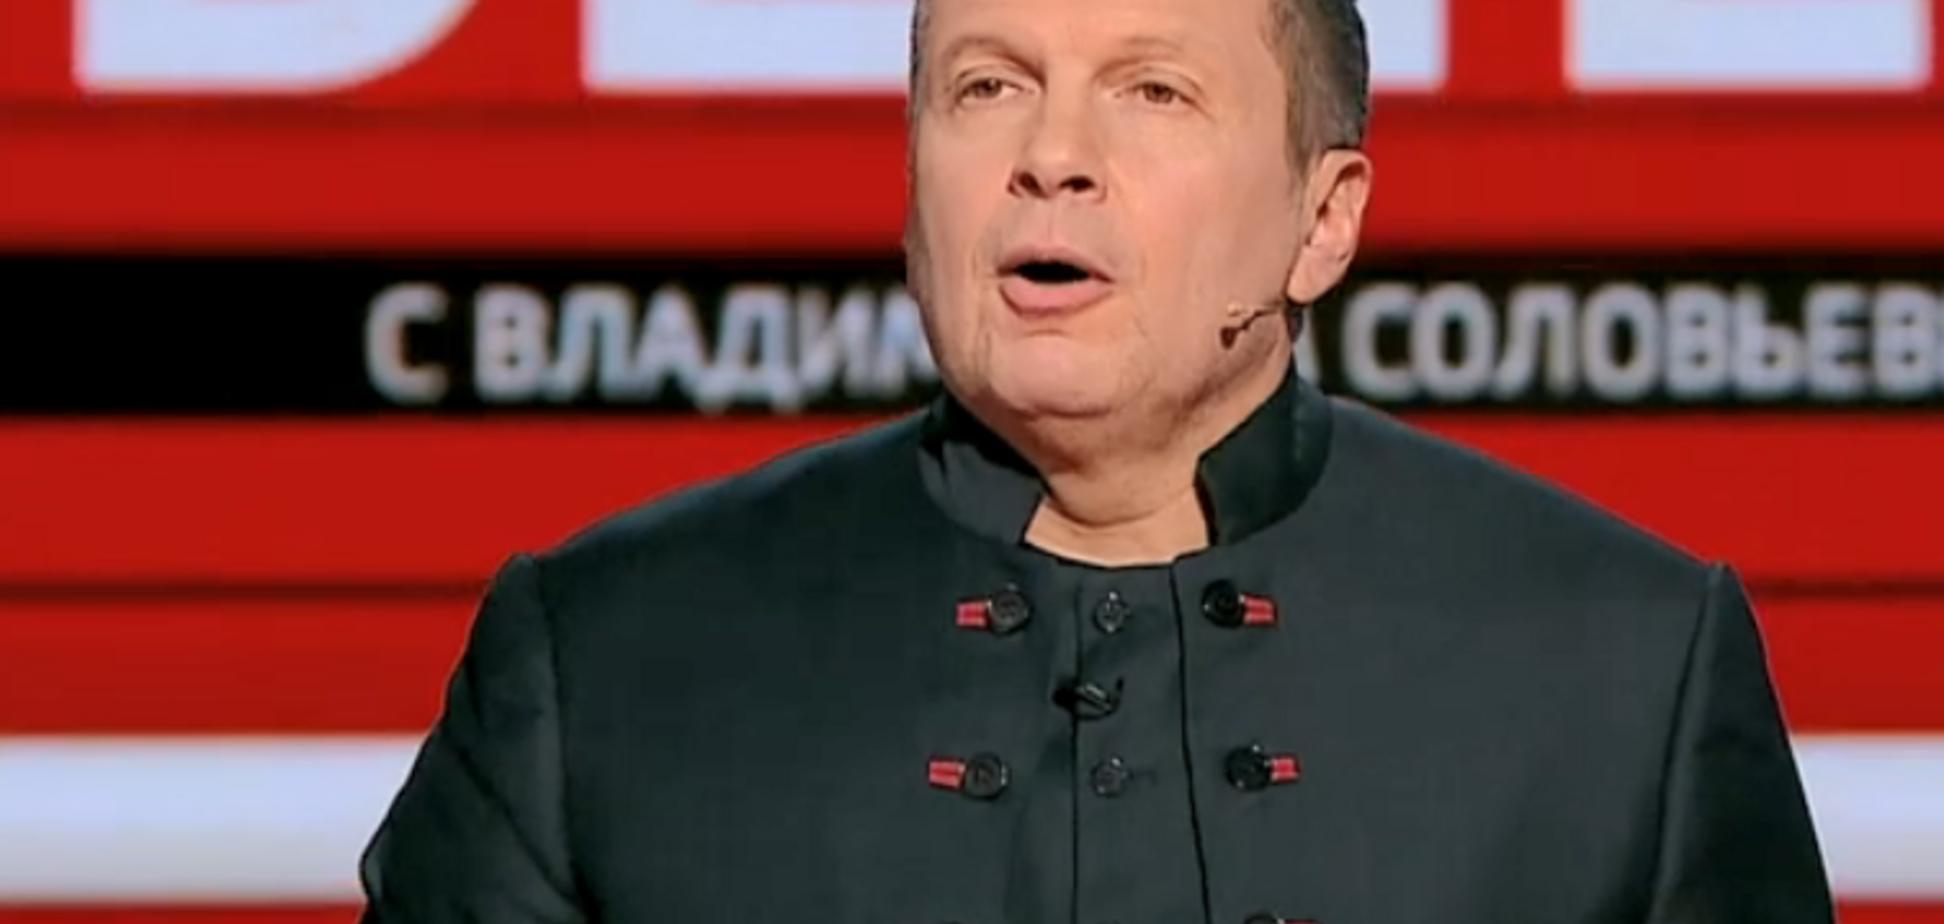 'Добивали жовто-блакитними пов'язочками!' Соловйов вибухнув обуреннями через УПА